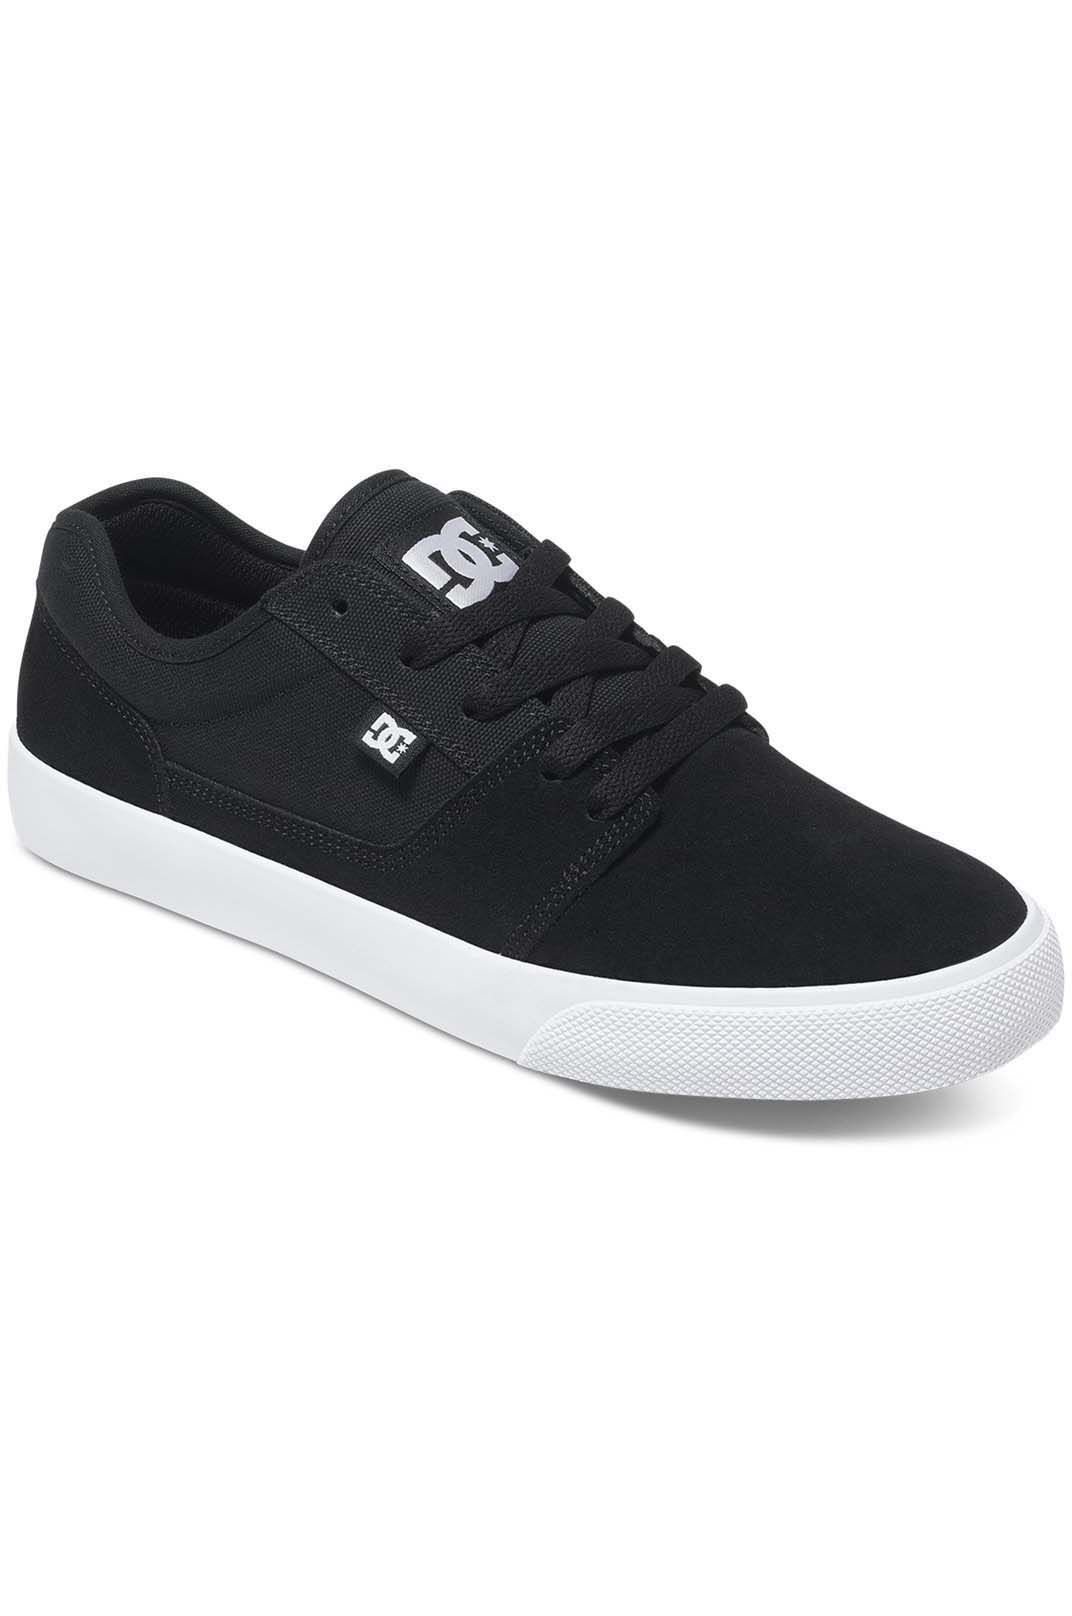 DC Shoes Shoes TONIK Black/White/Black